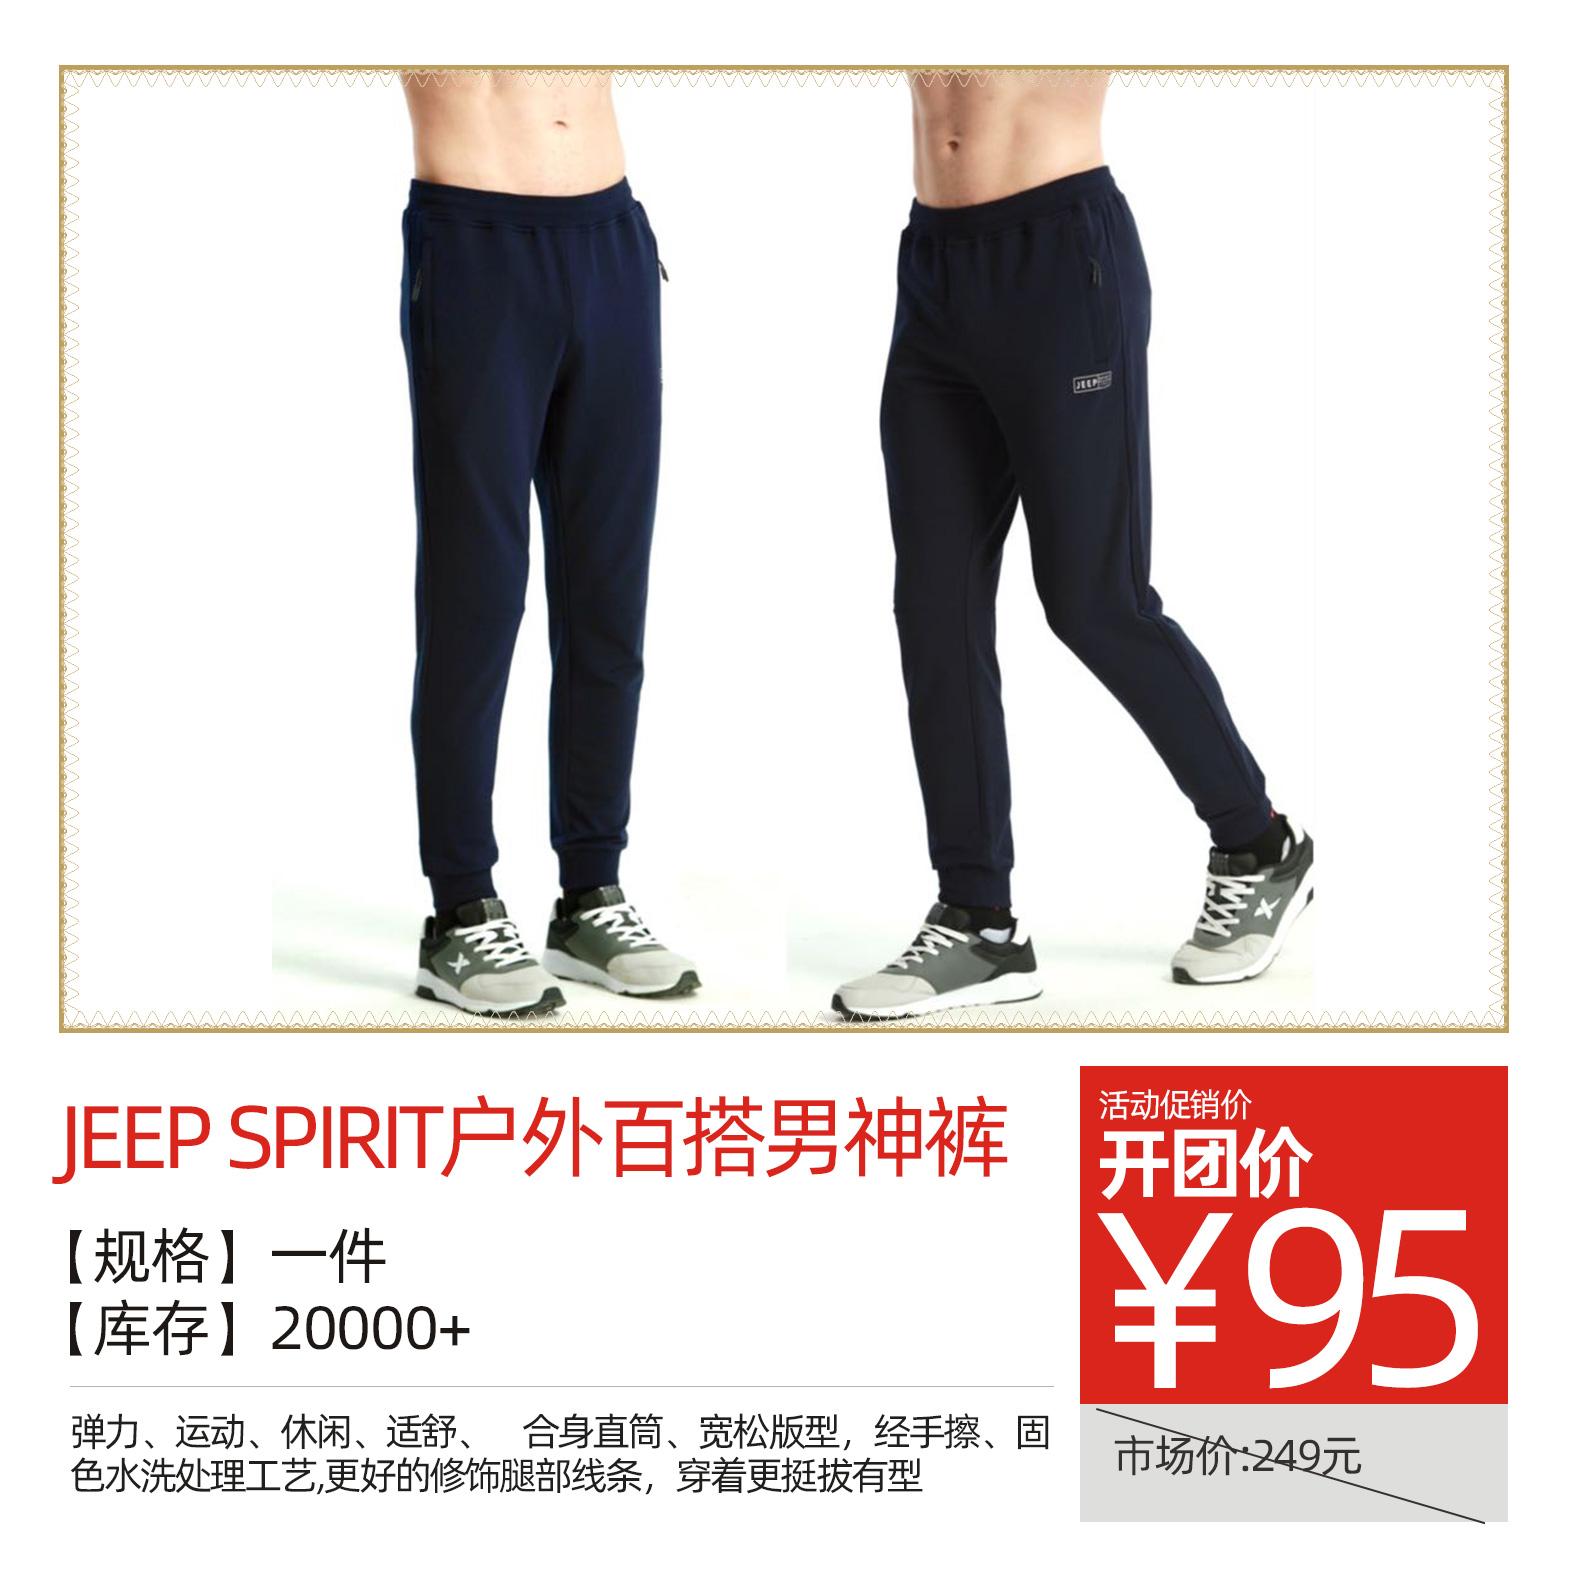 Jeep SPIRIT户外百搭男神裤